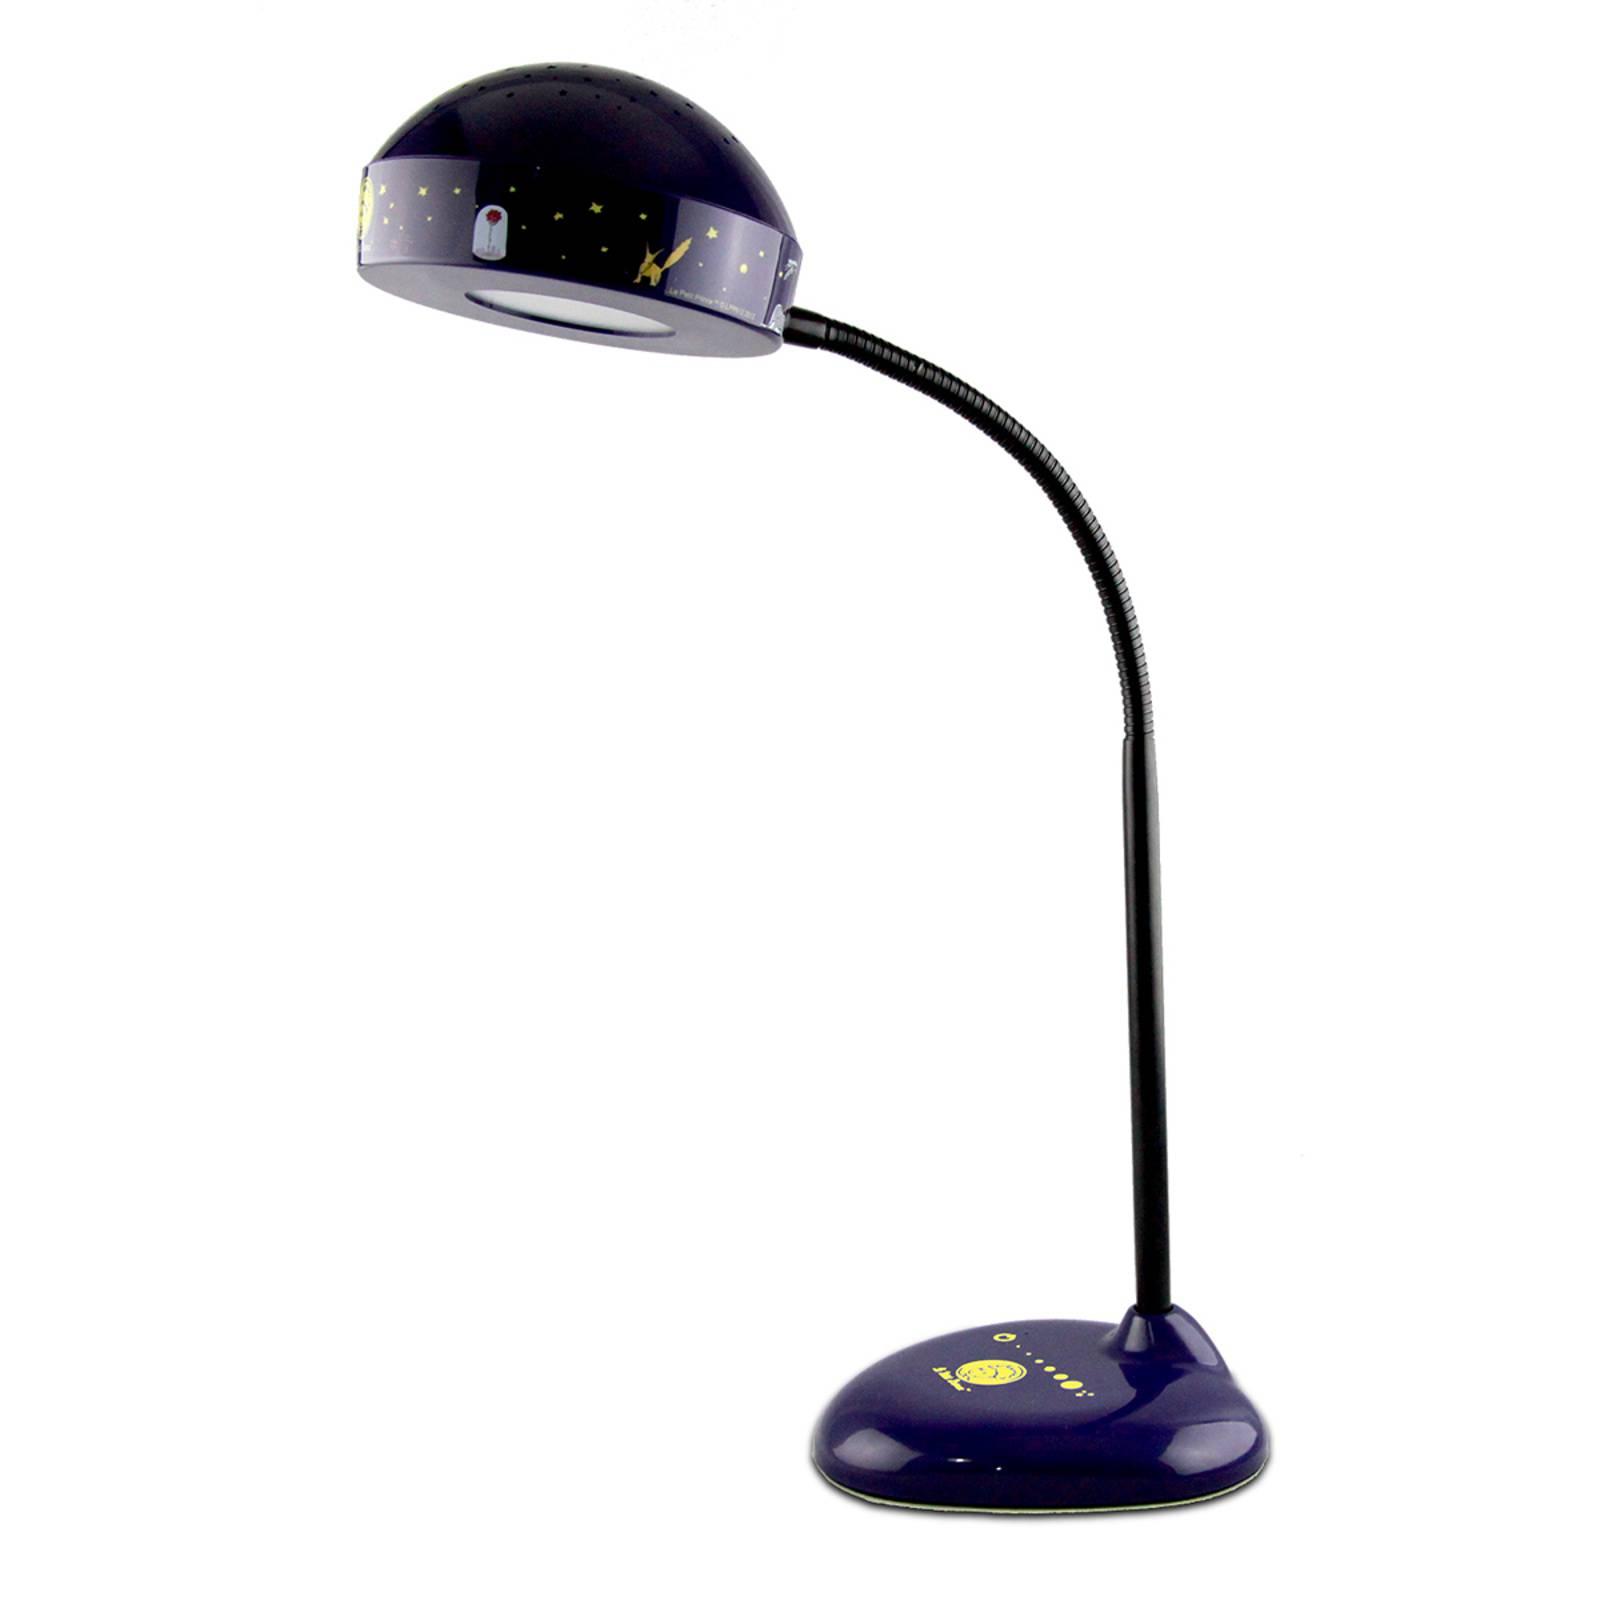 LED bureaulamp Kleine prins met nachtlamp